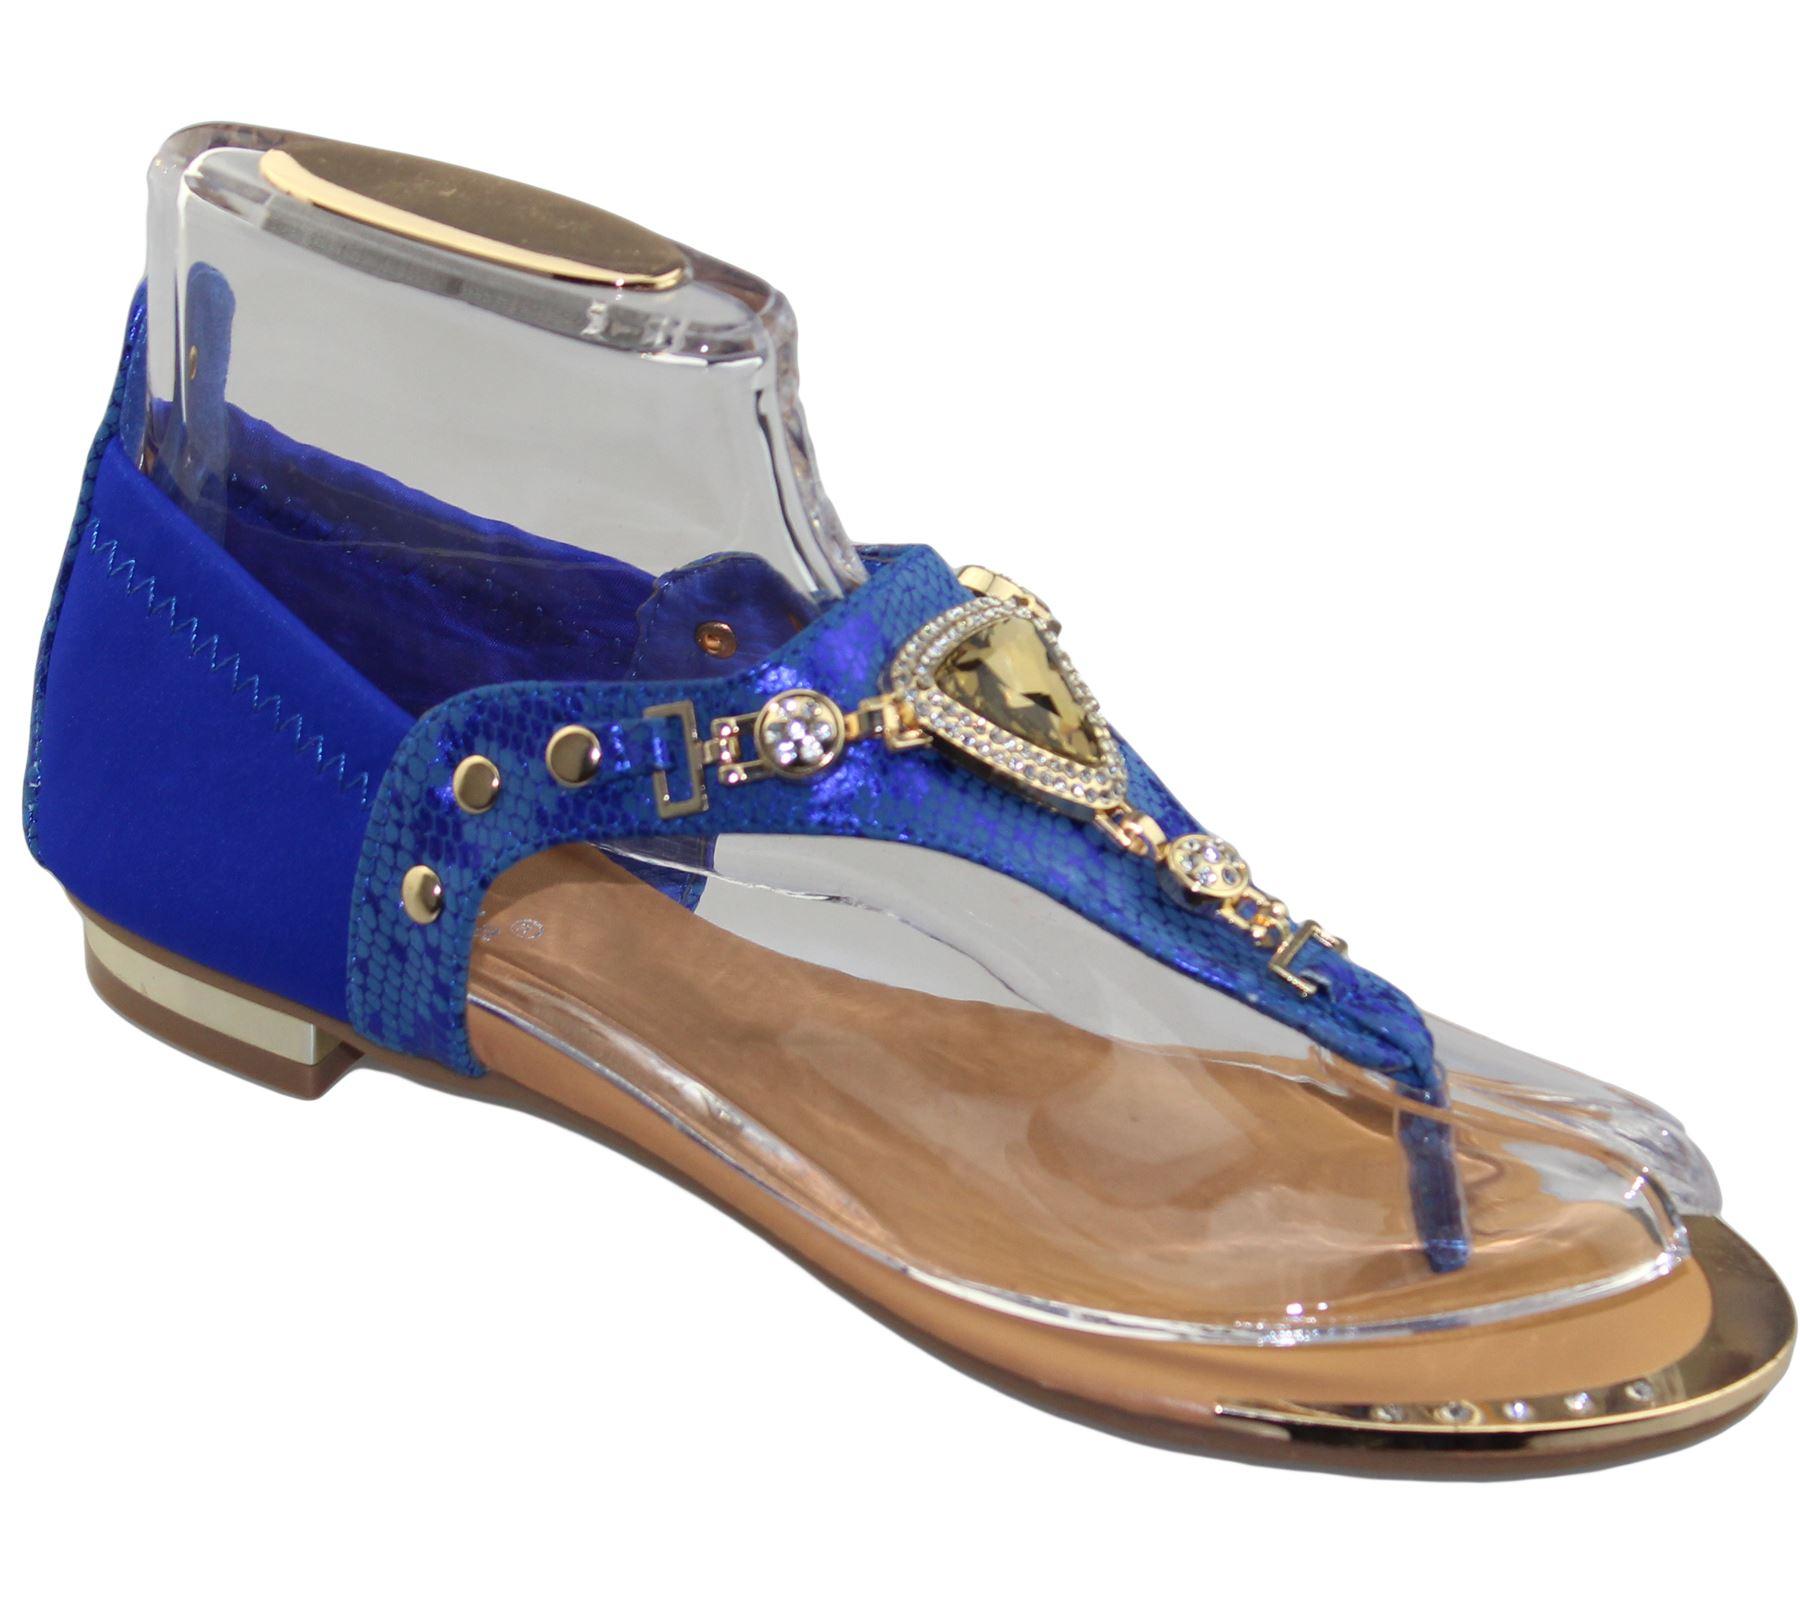 Womens-Flat-Summer-Sandals-Ladies-Diamante-Wedding-Toe-Post-Casual-Slipper thumbnail 24